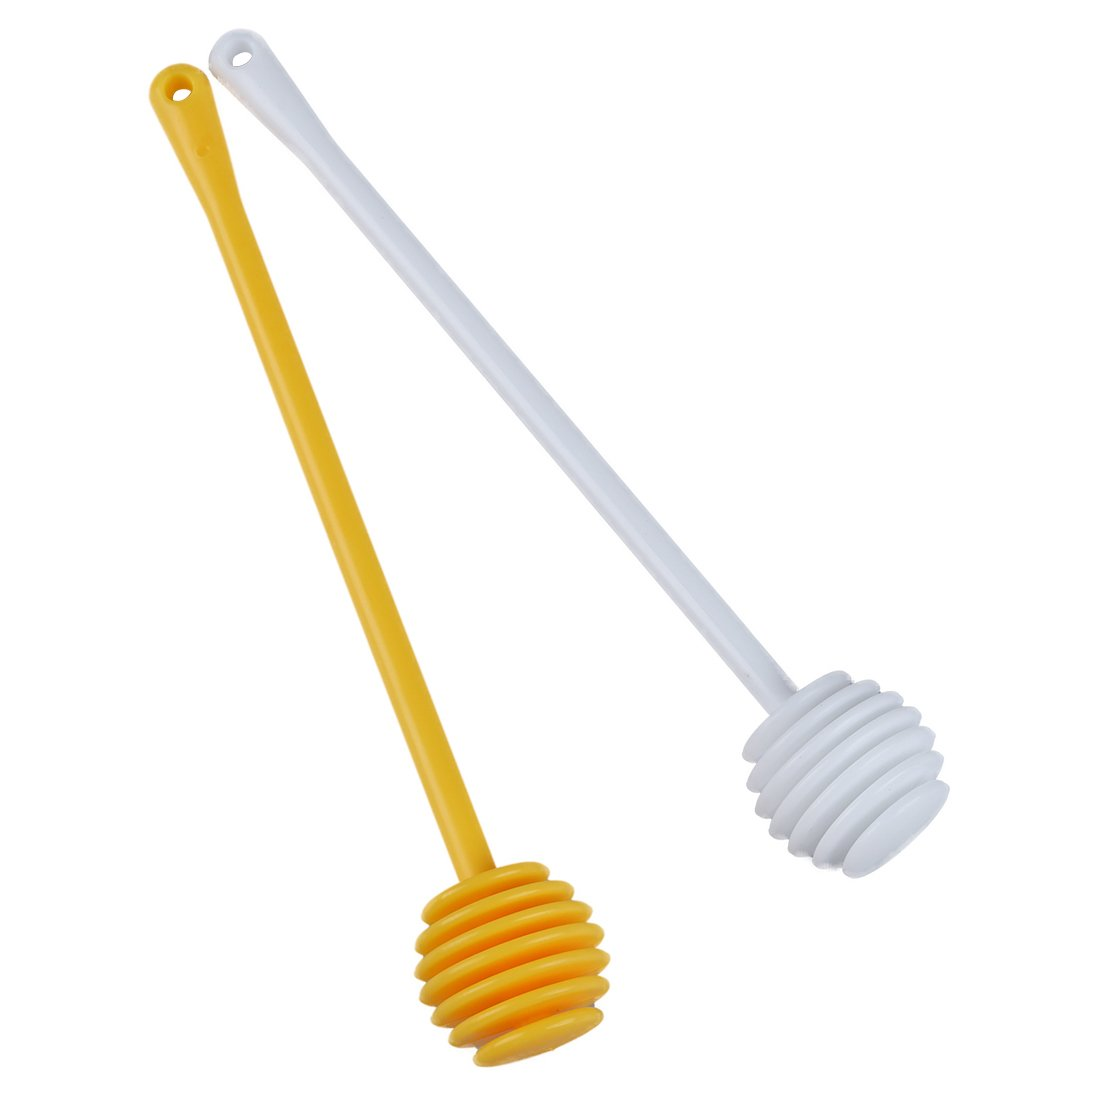 TOOGOO(R) 2Pcs Honey Dipper Jam Stir Sticks Long Handle Yellow + White SHOMAGT14074